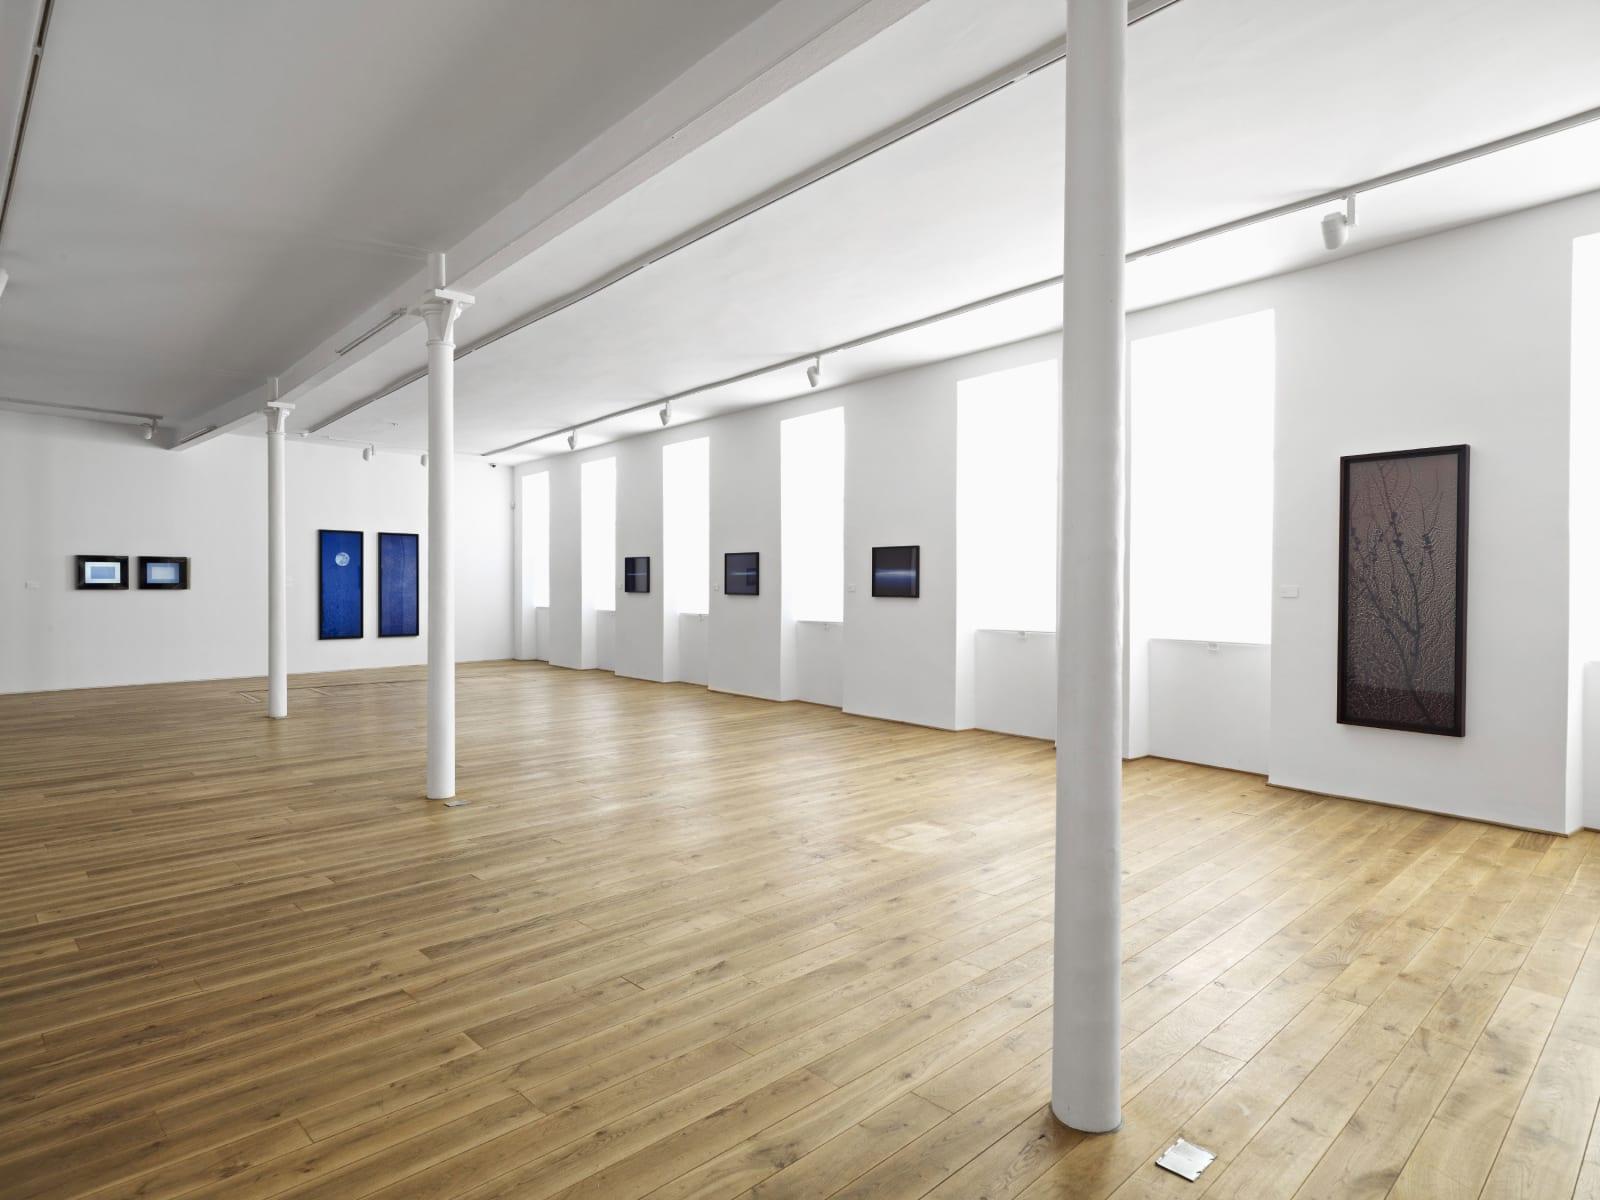 Installation view of A Little Bit of Magic Realised, Ingleby Gallery, Edinburgh